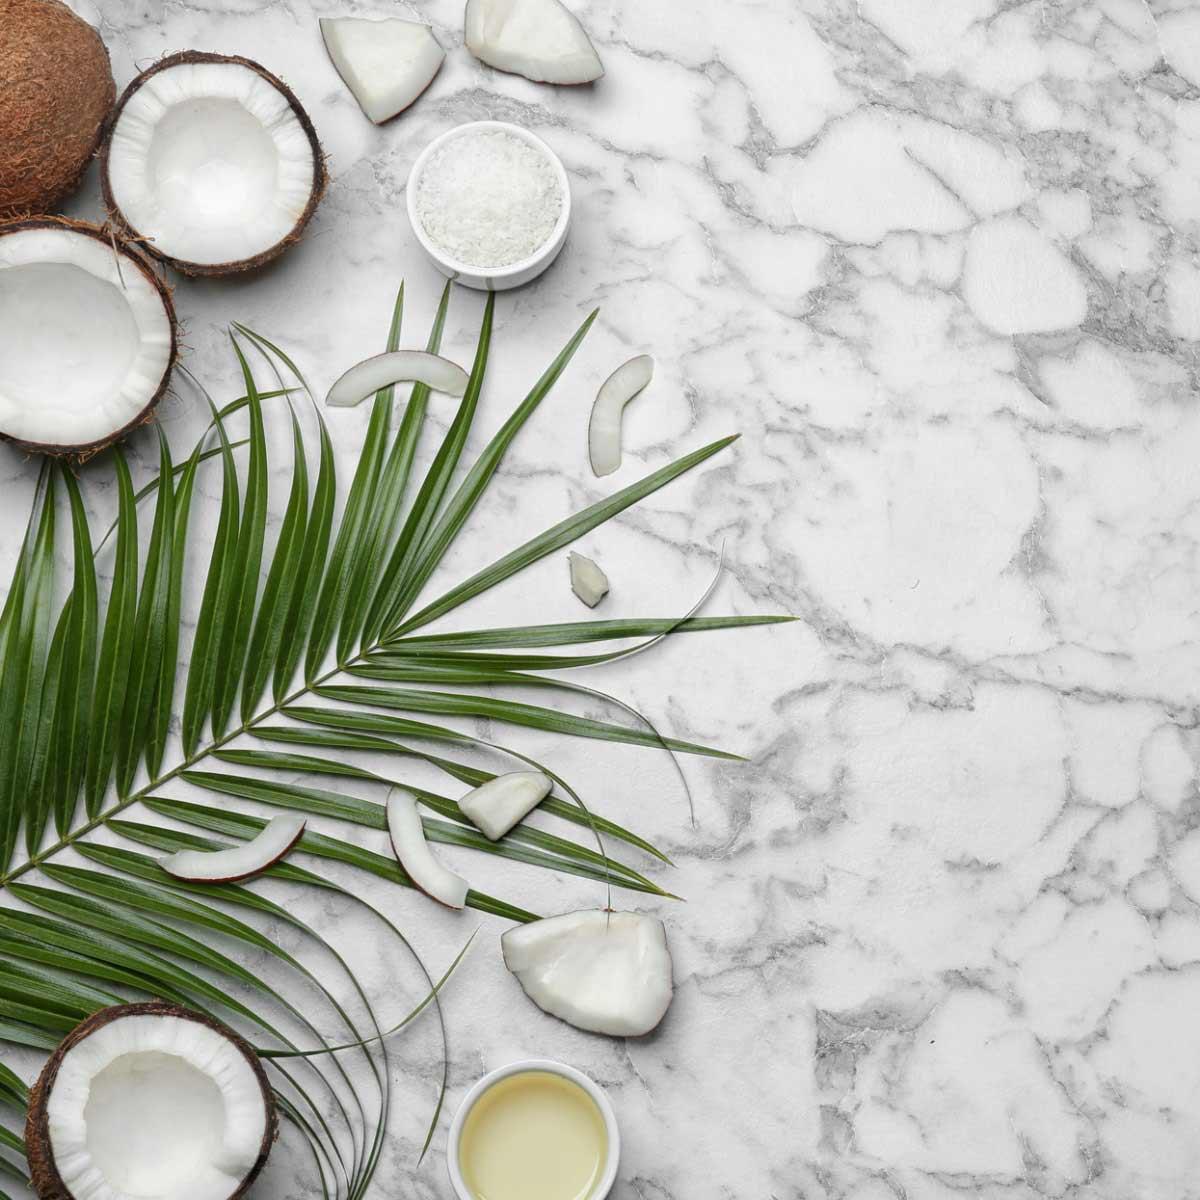 Kokosoel anwendungen